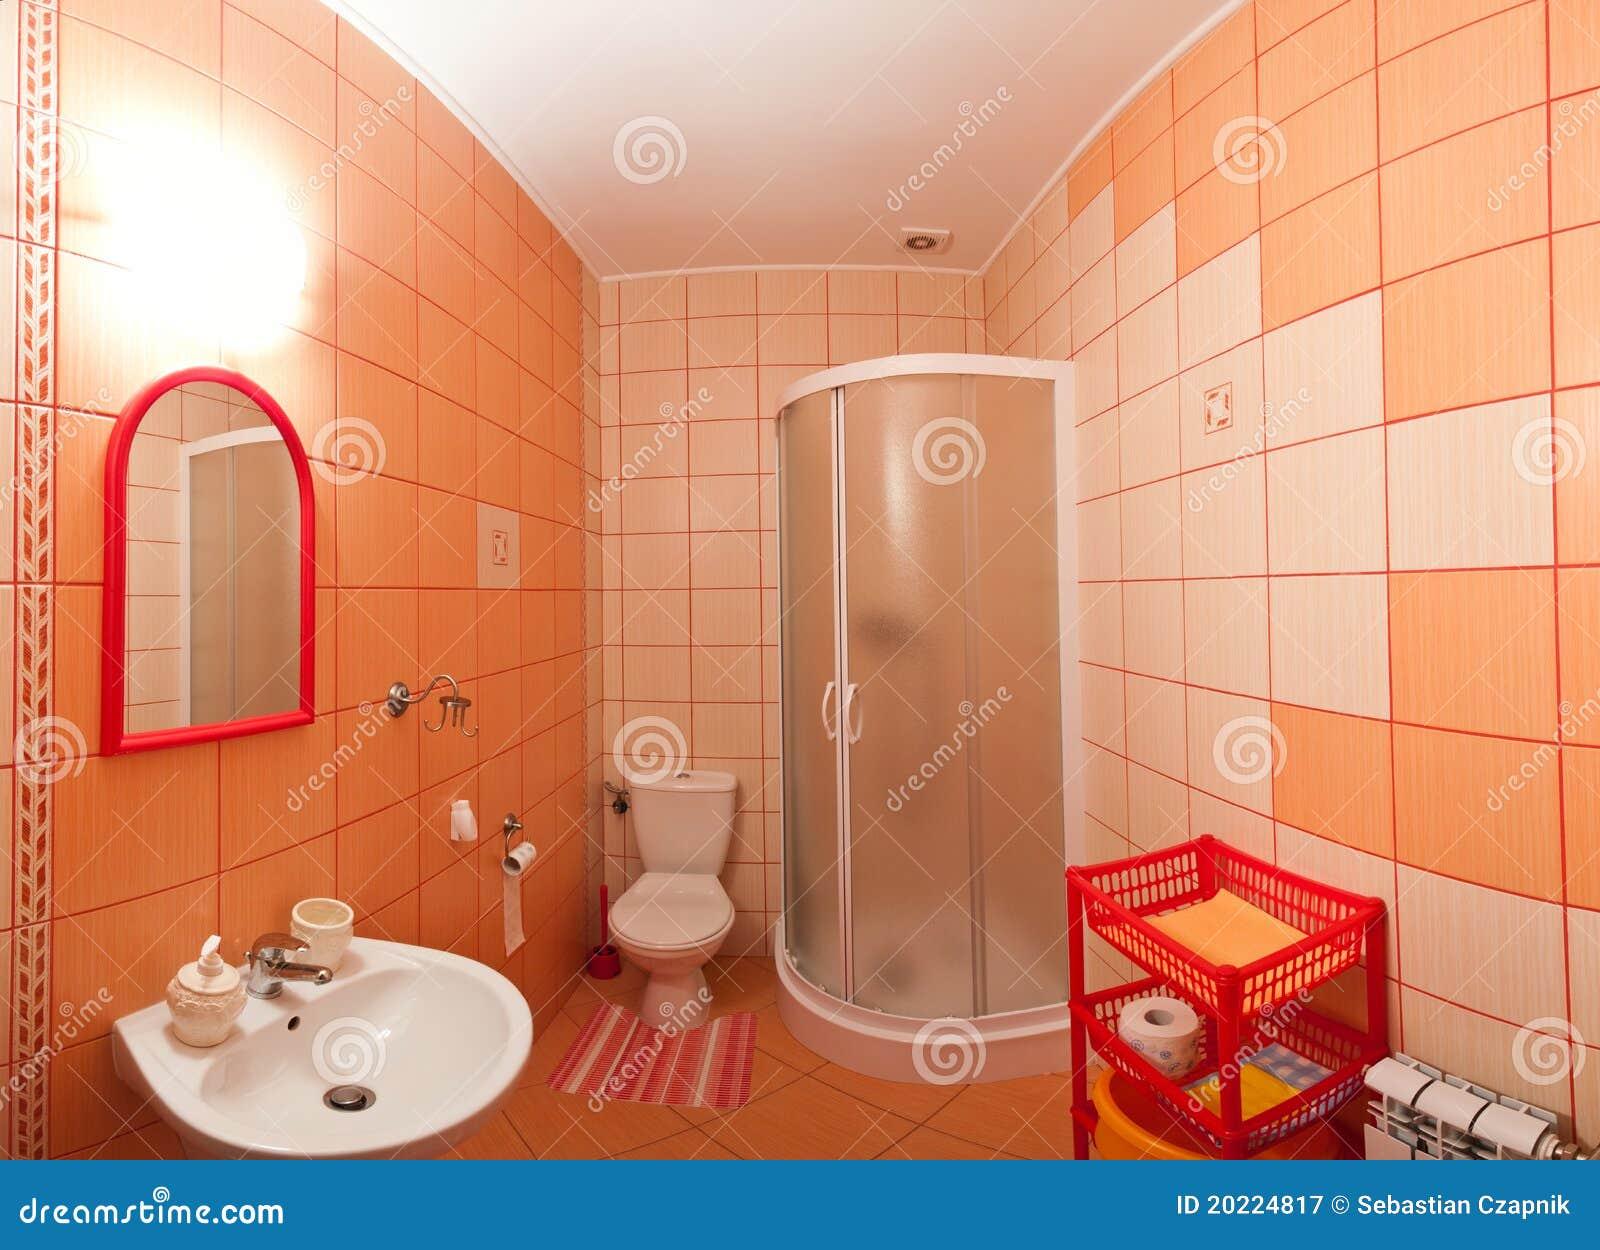 Piastrelle Arancioni Per Bagno piastrelle bagno arancione arredo bagno arancione ambazac